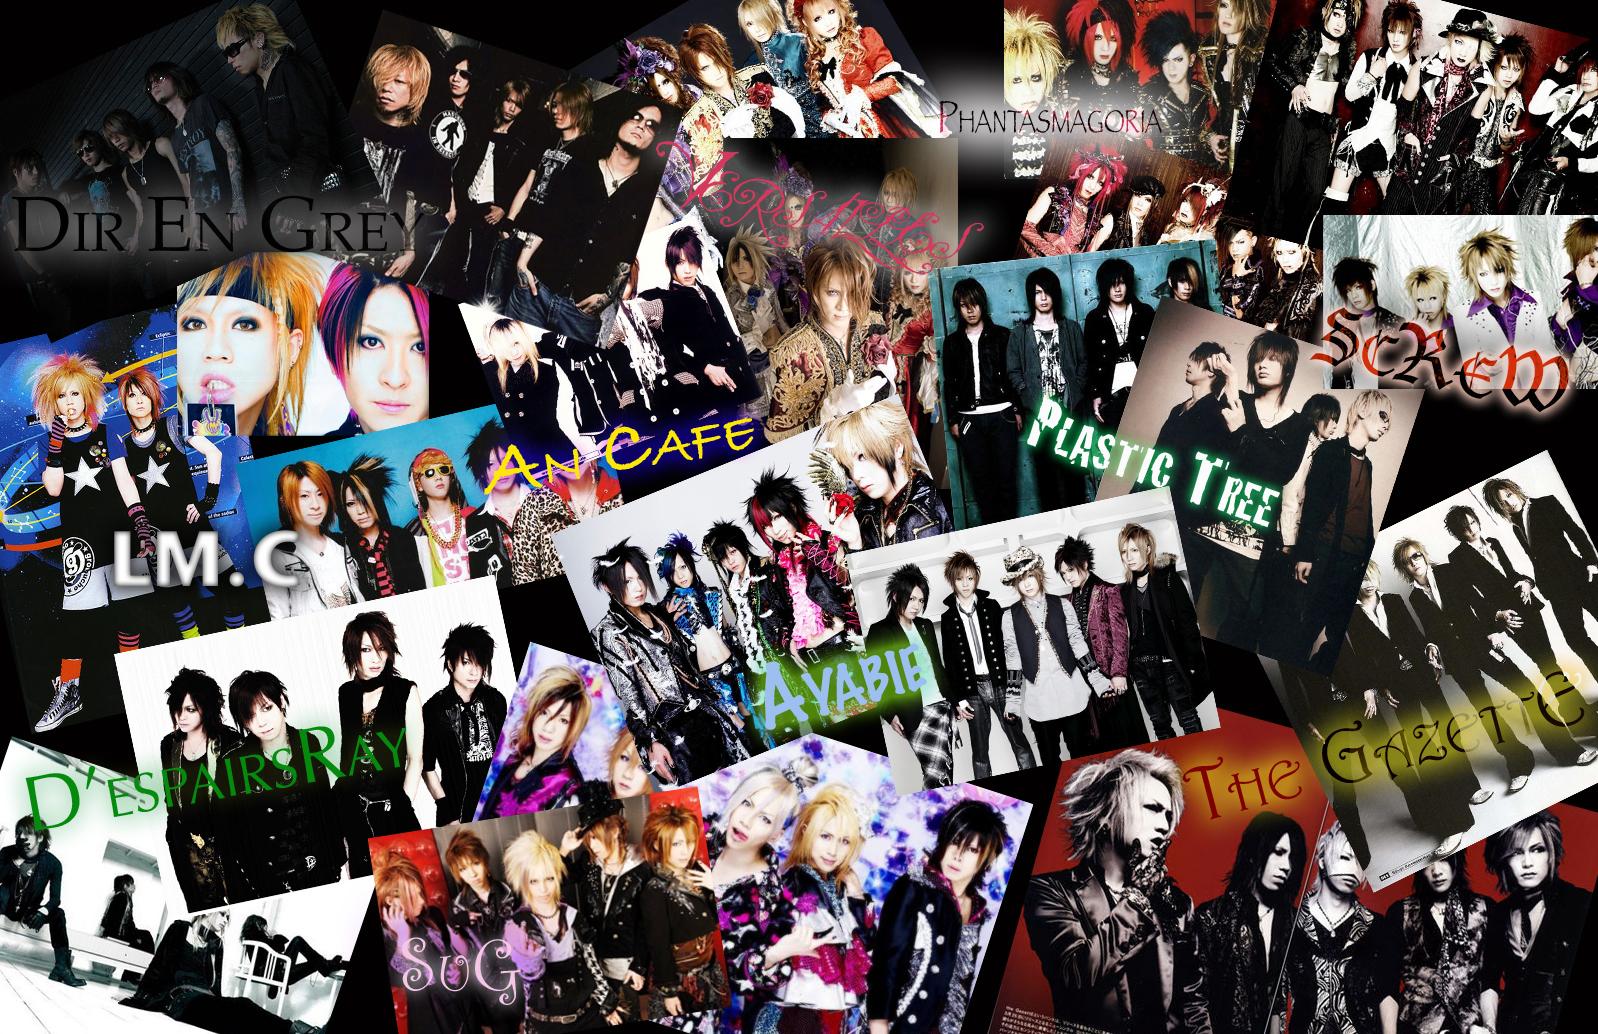 http://fc08.deviantart.net/fs41/f/2009/047/9/8/J_rock__VK_Wallpaper_Vrs__2_by_Emaru_sama.jpg